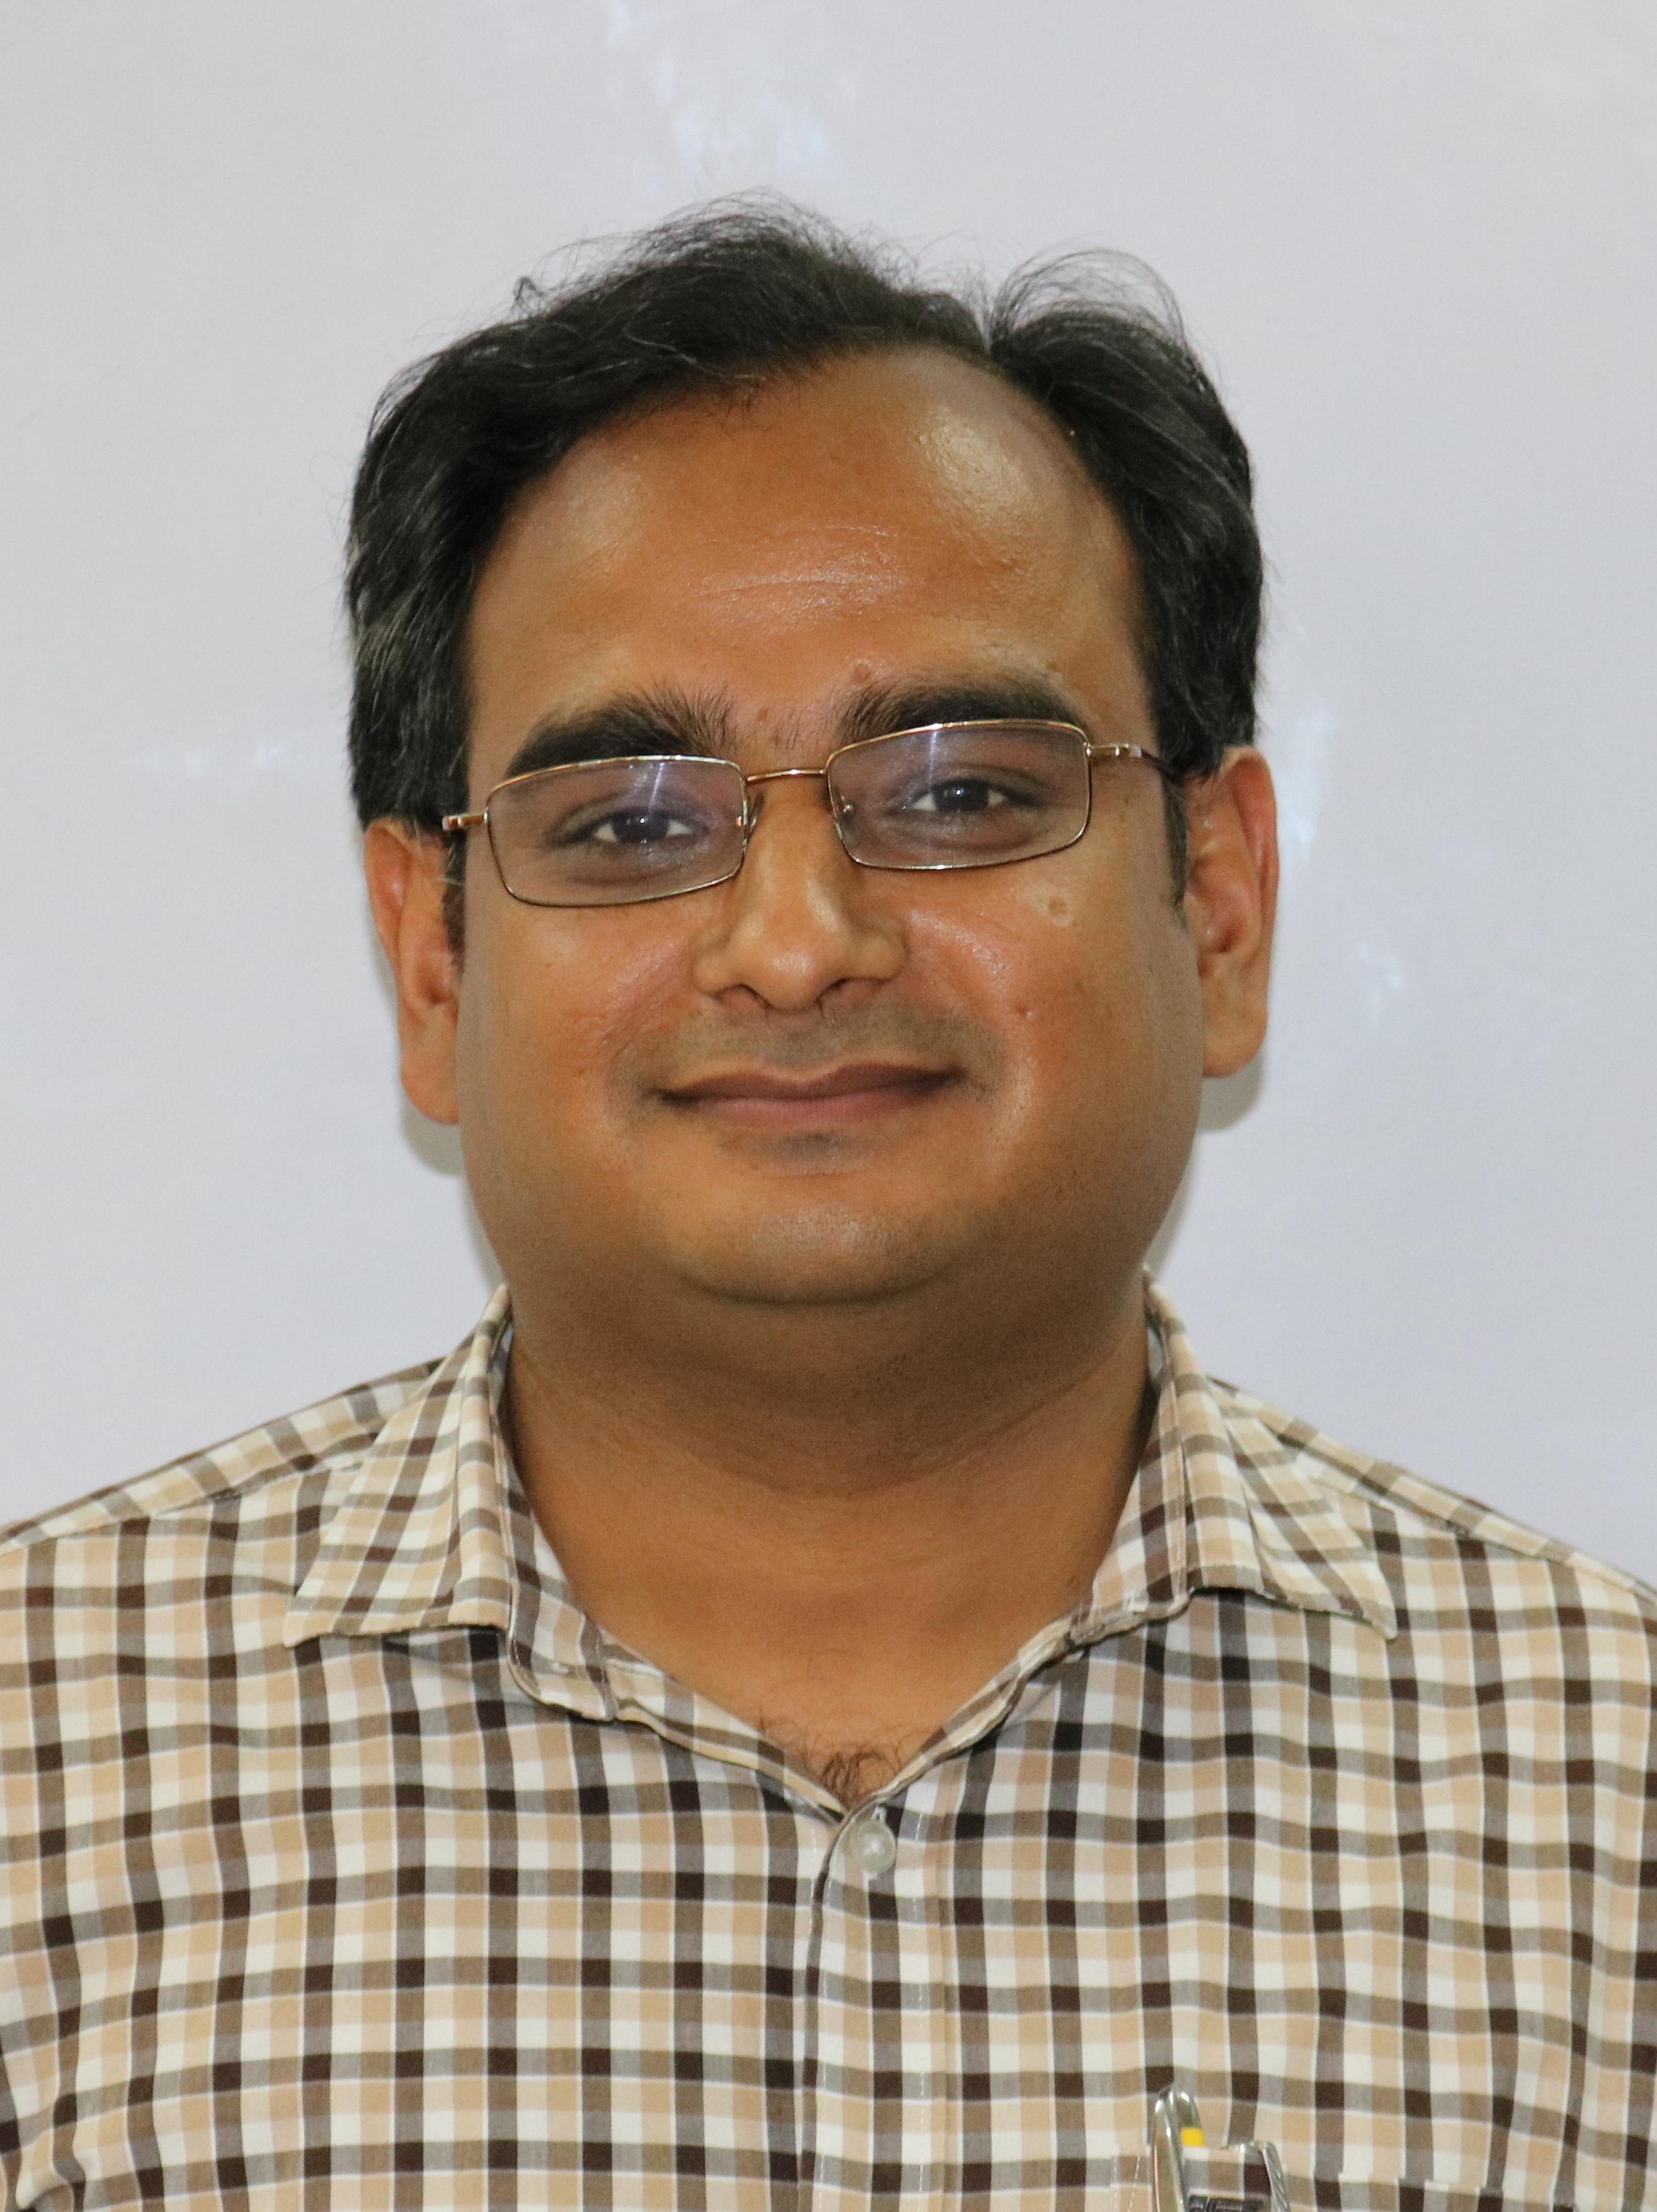 BHAVESH PANDEY